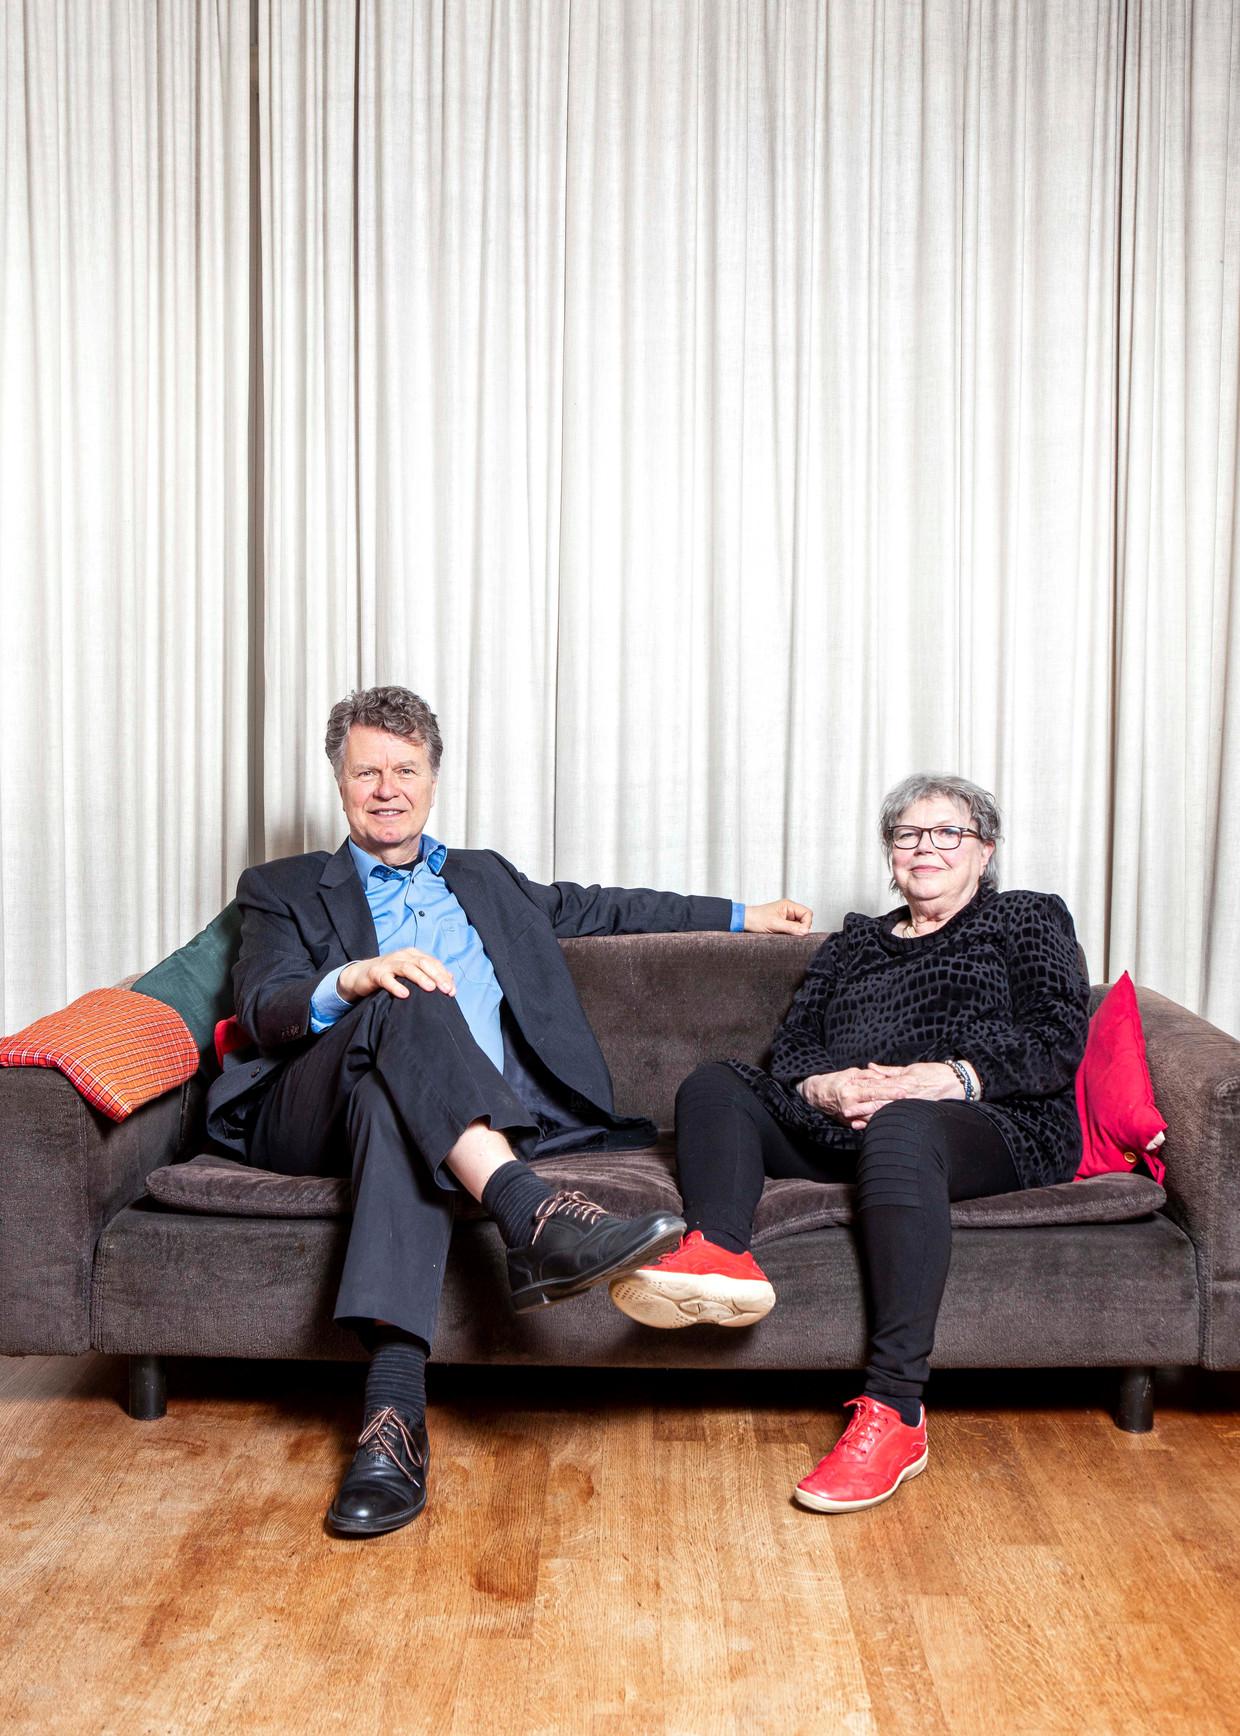 Boris Dittrich en Winnie van Rossem. Beeld Hilde Harshagen